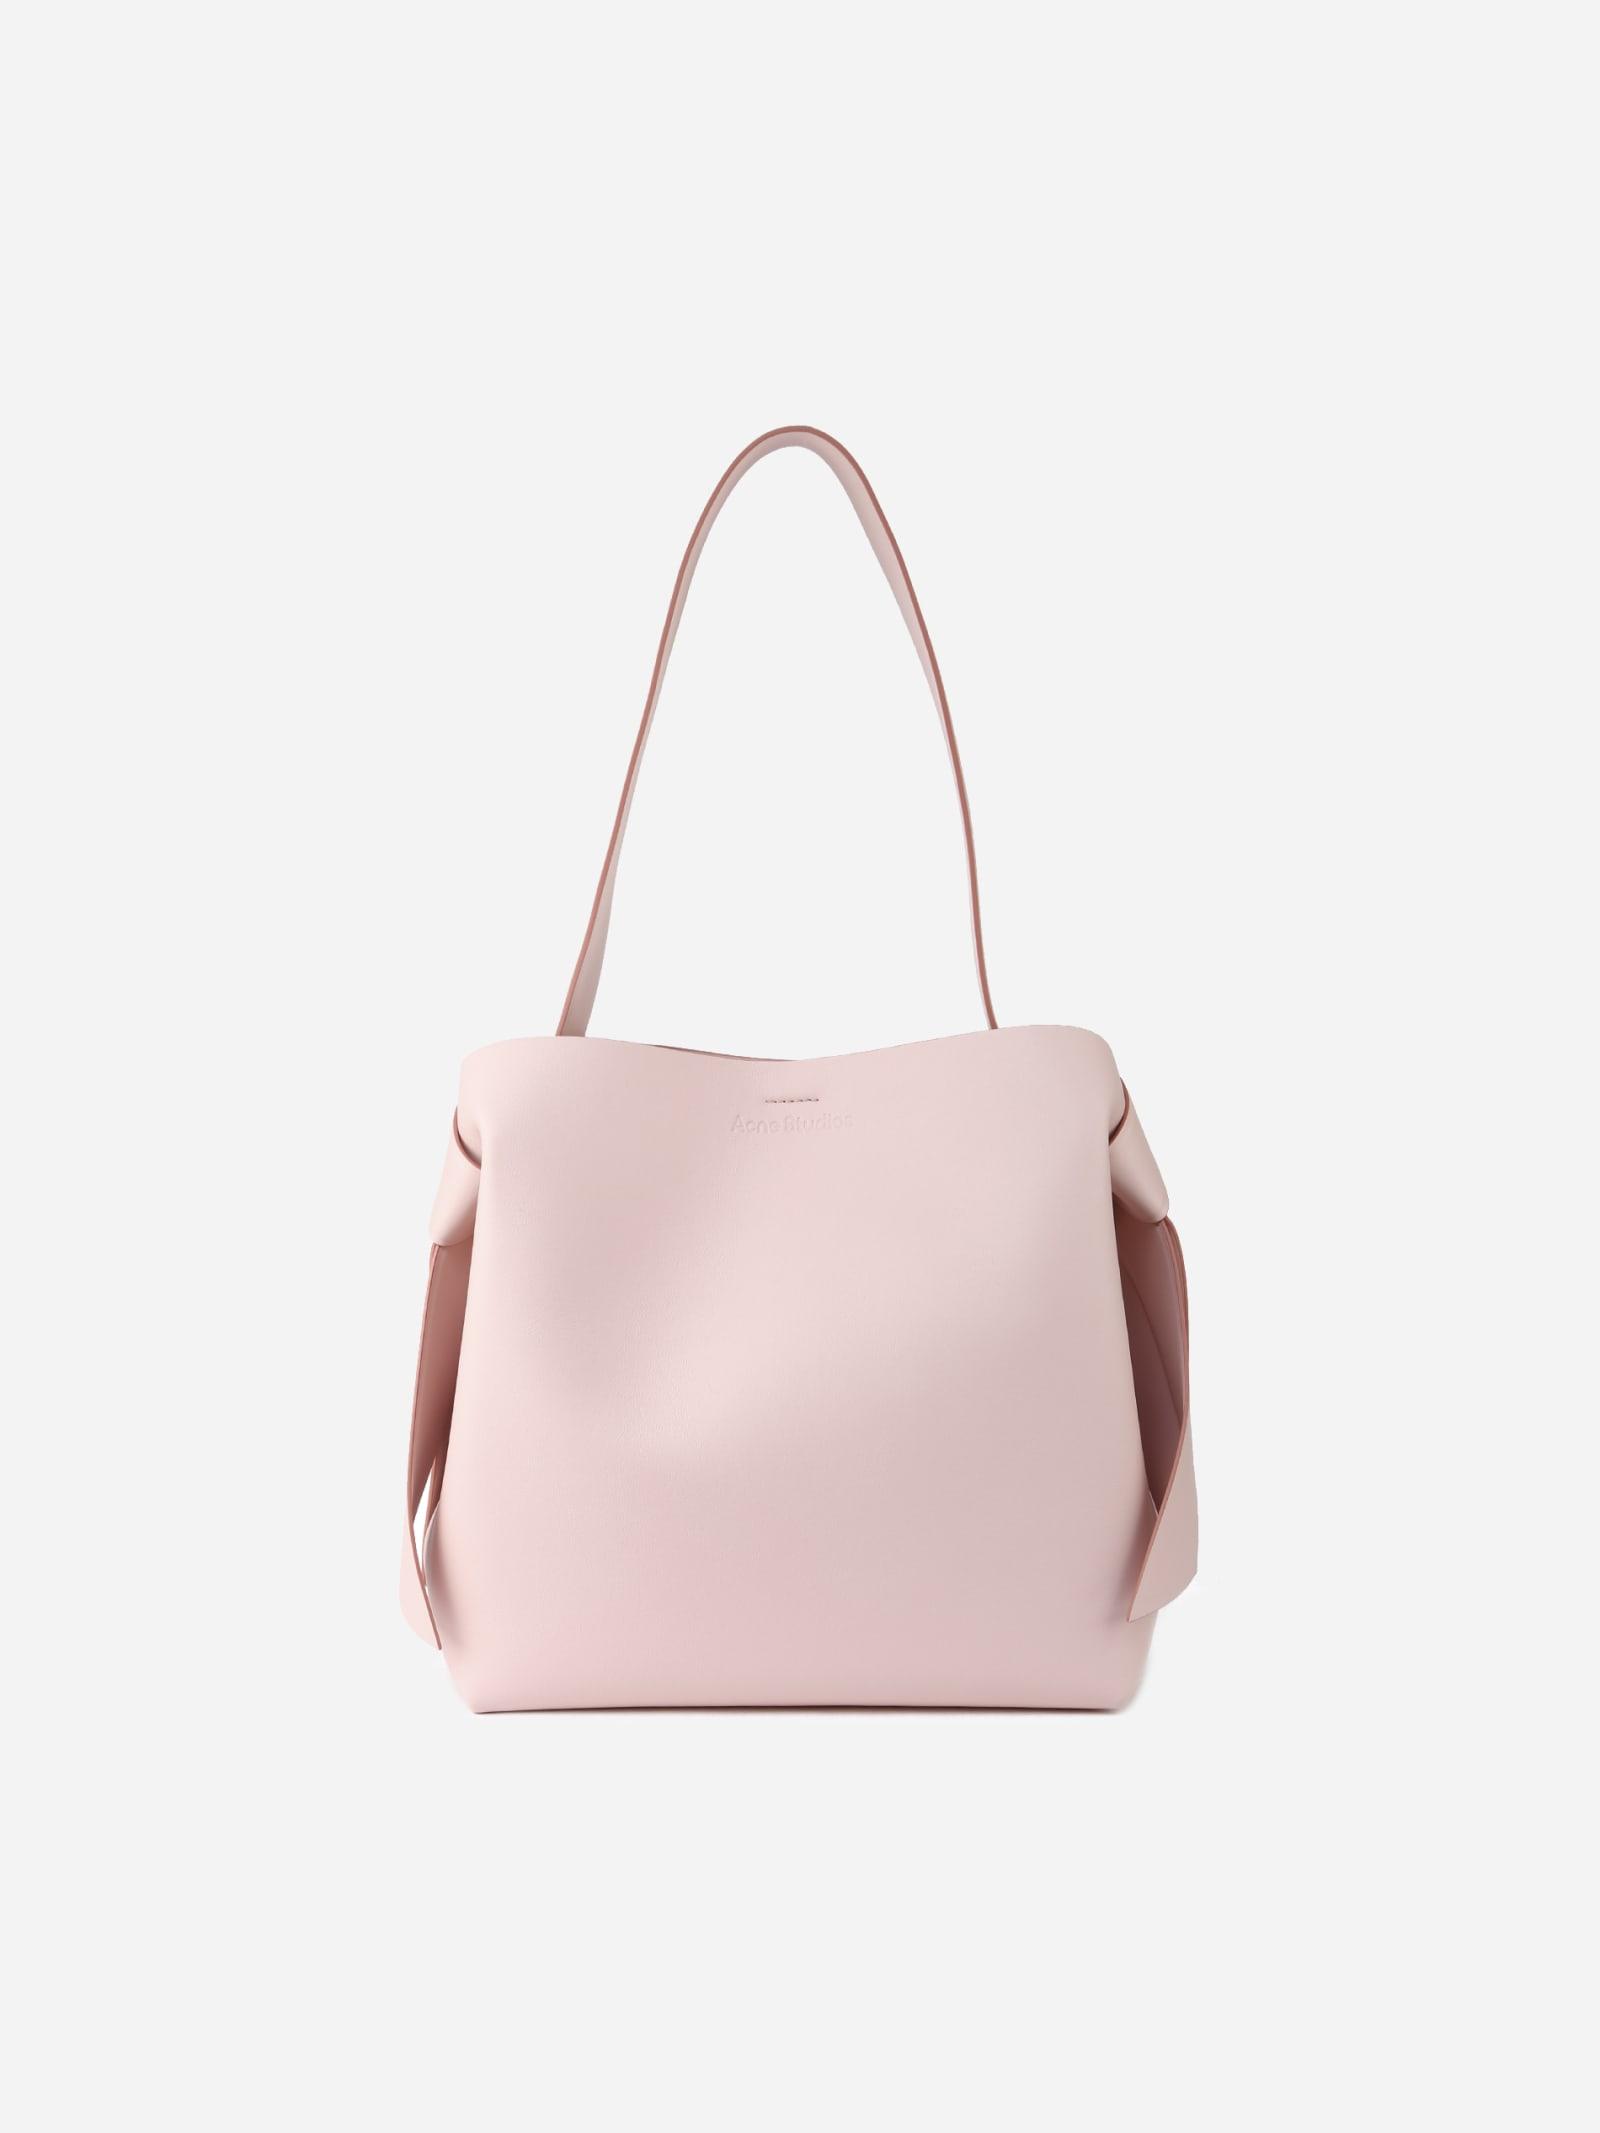 Acne Studios Musubi Shoulder Bag In Leather